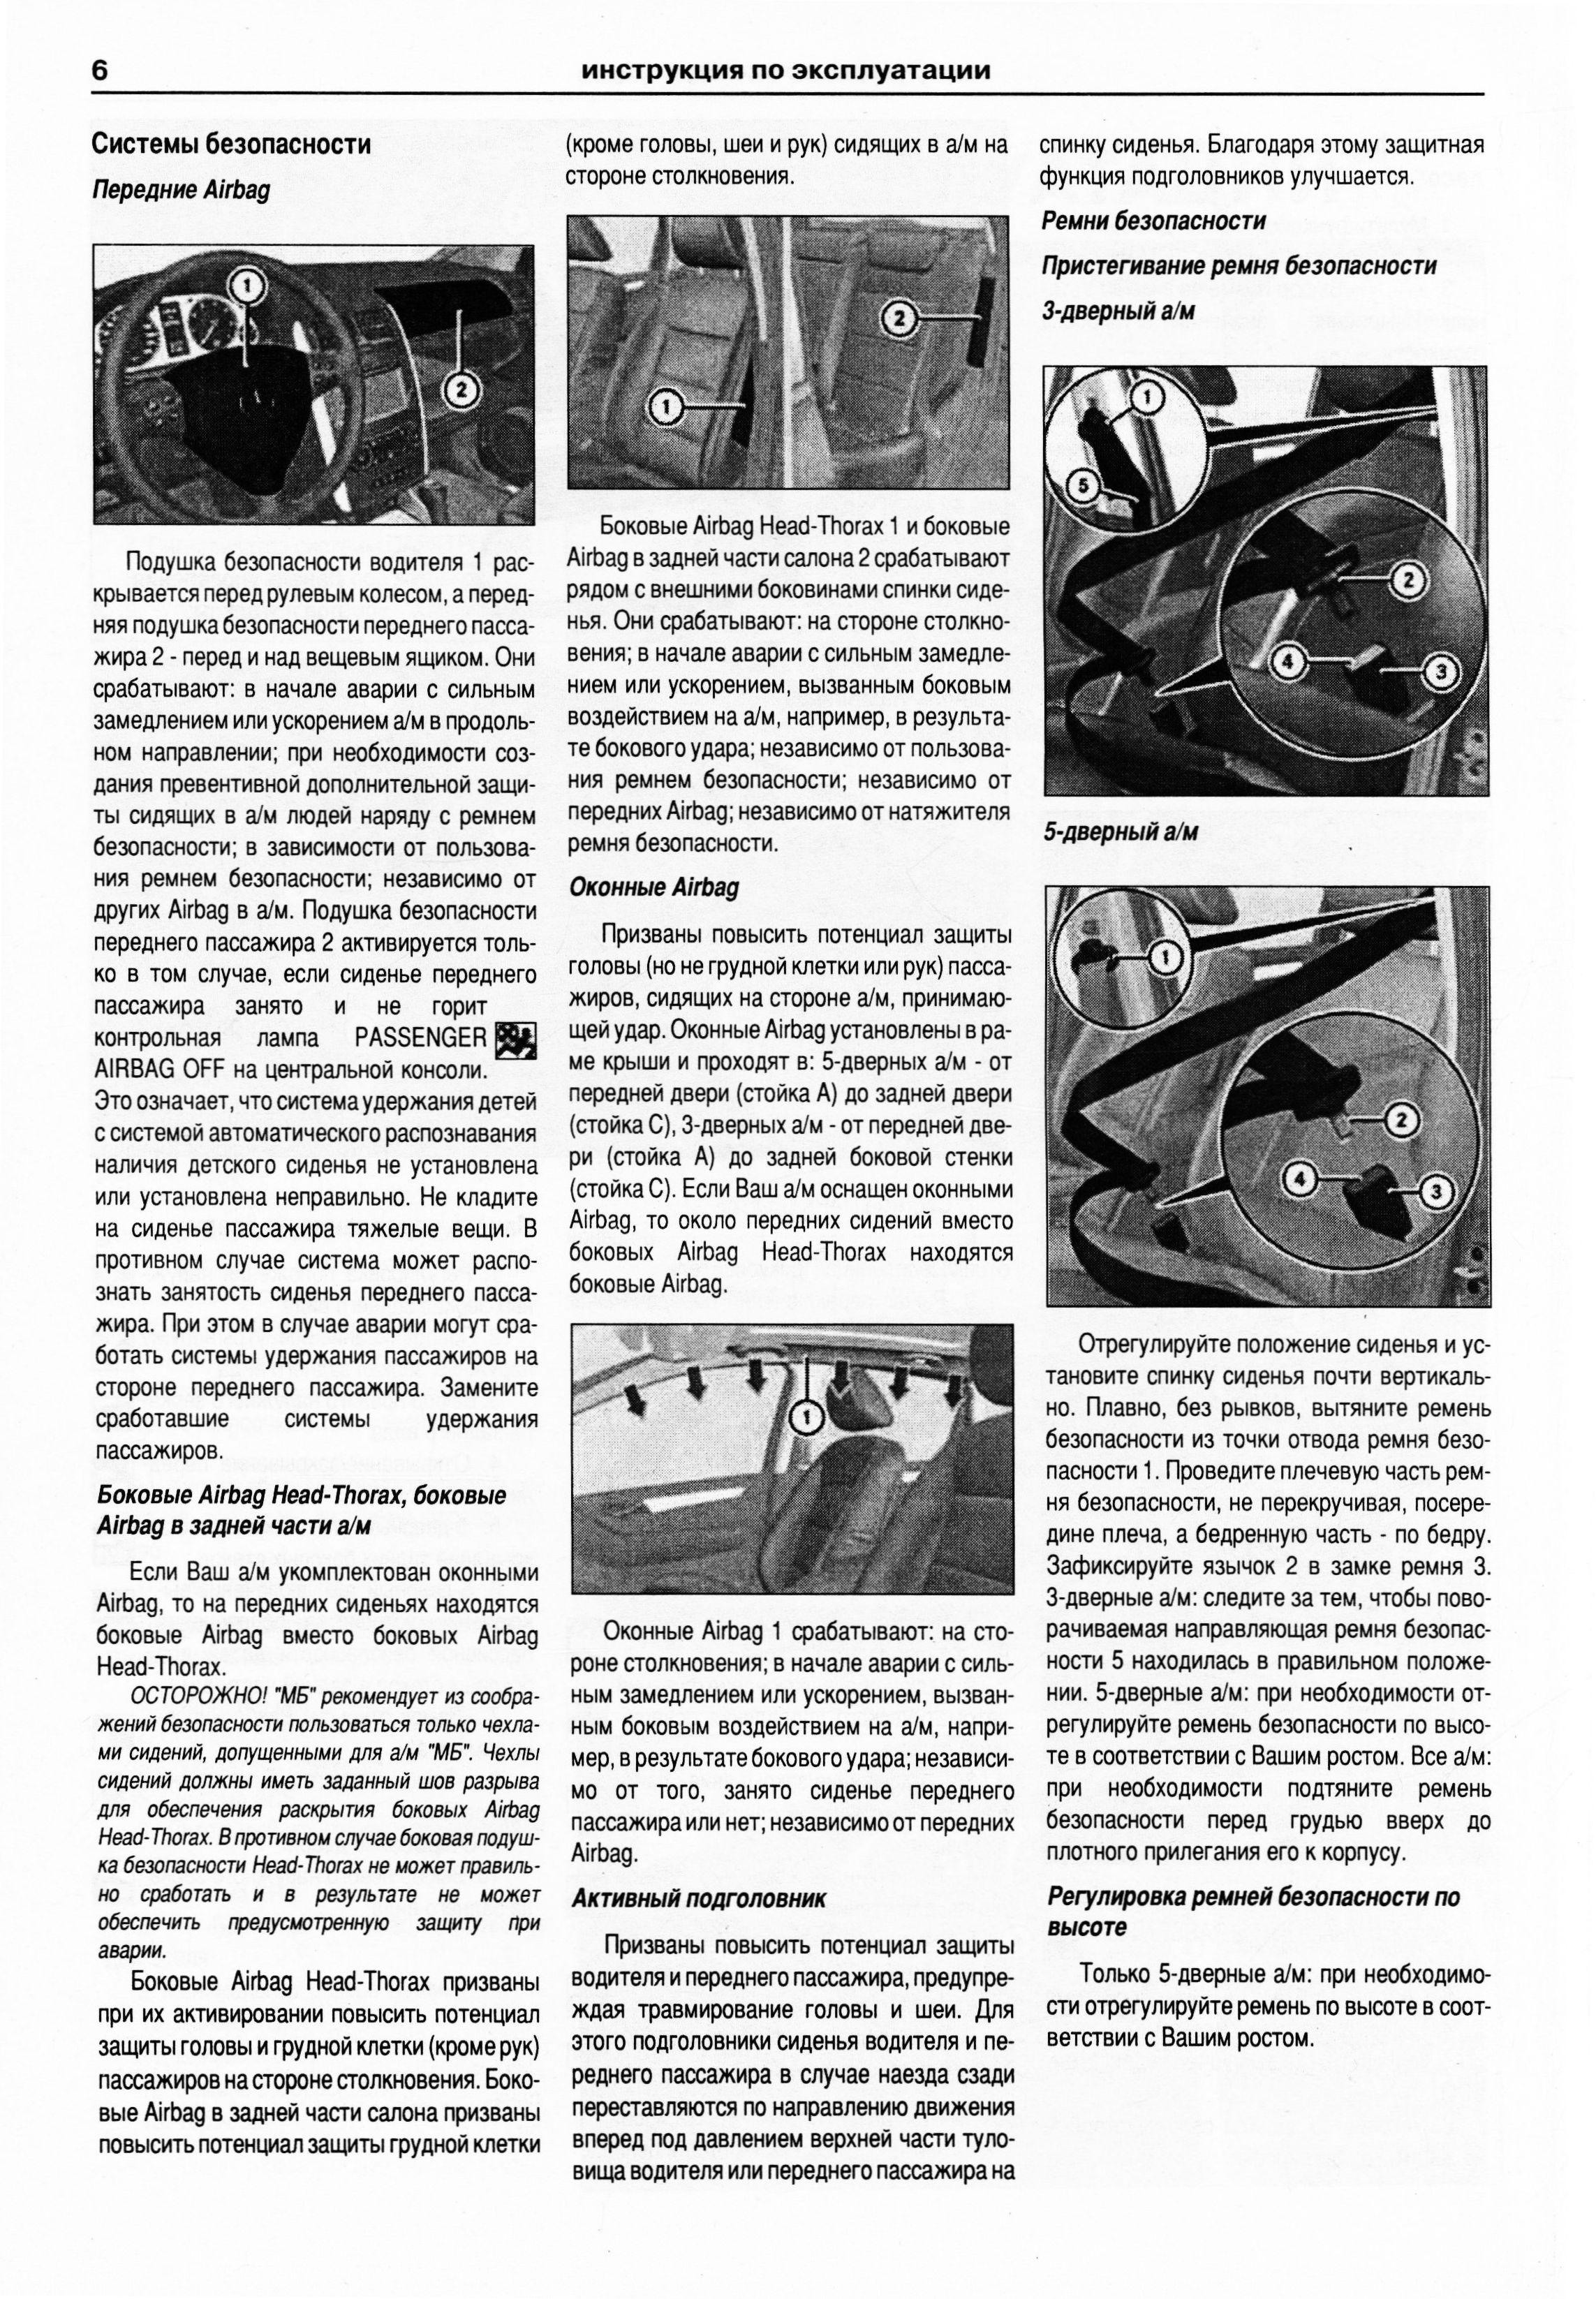 W245 mercedes руководство по эксплуатации